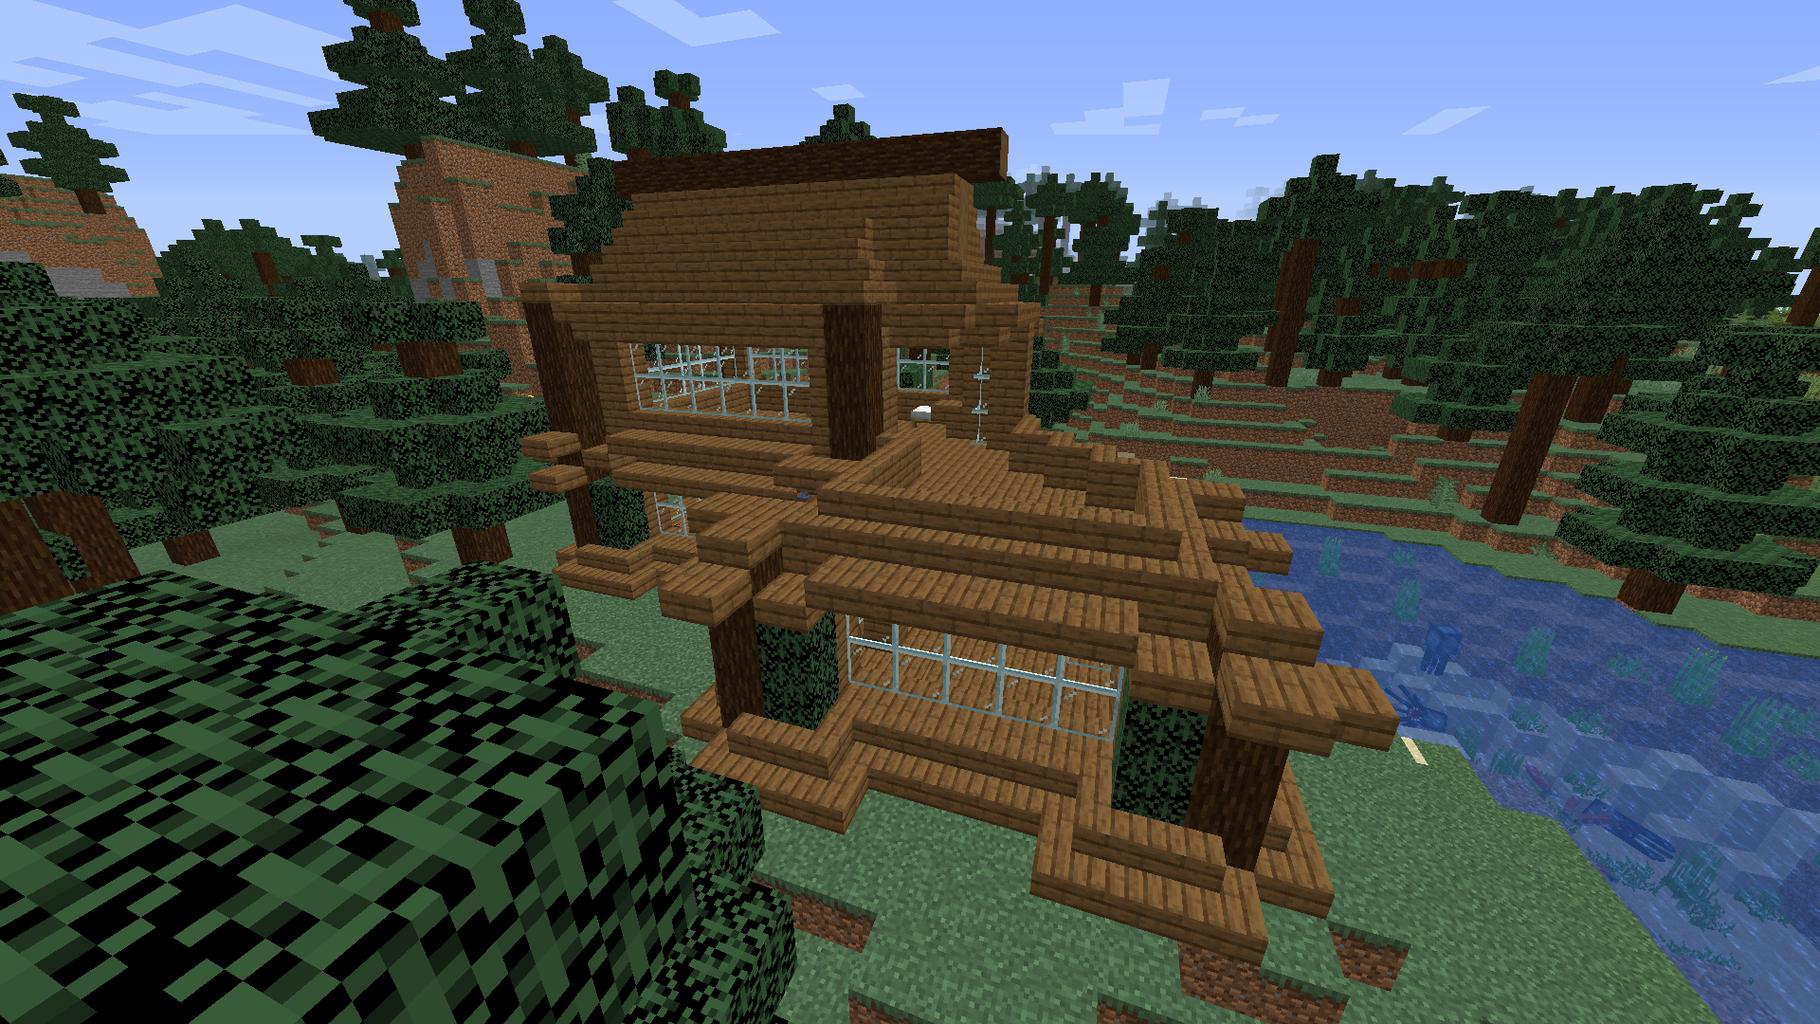 How to Make a Decent Minecraft Abode